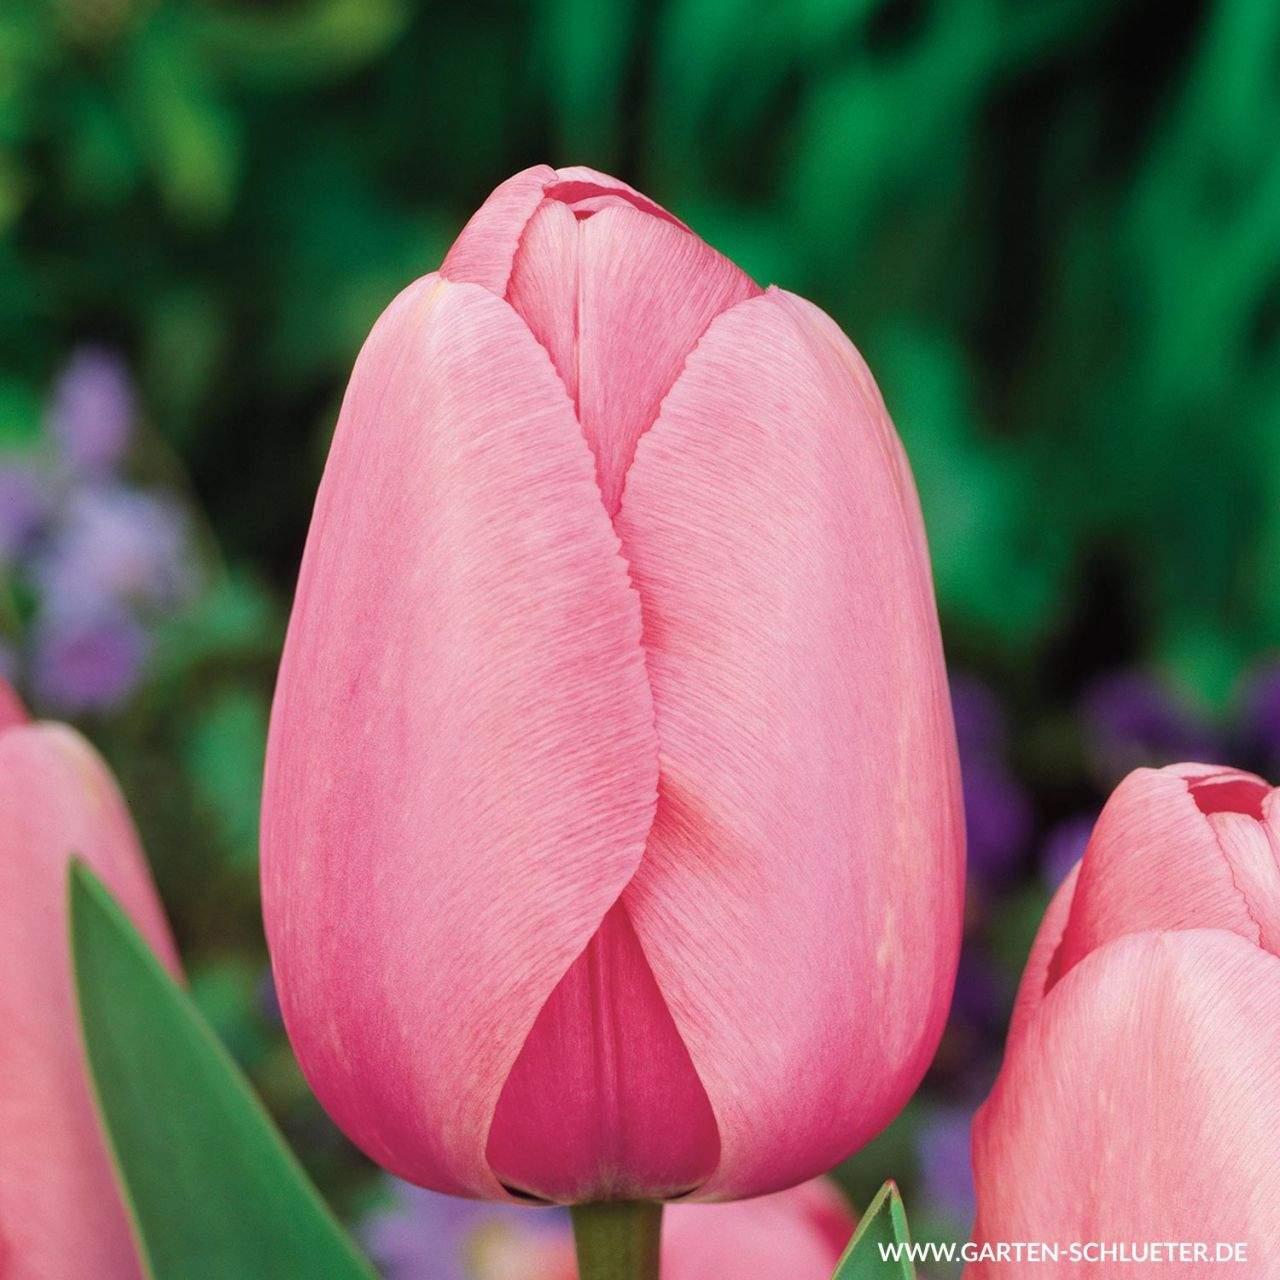 1 Darwin Hybrid Tulpe Pink Impression 10 Stueck Tulipa Pink Impression 1280x1280